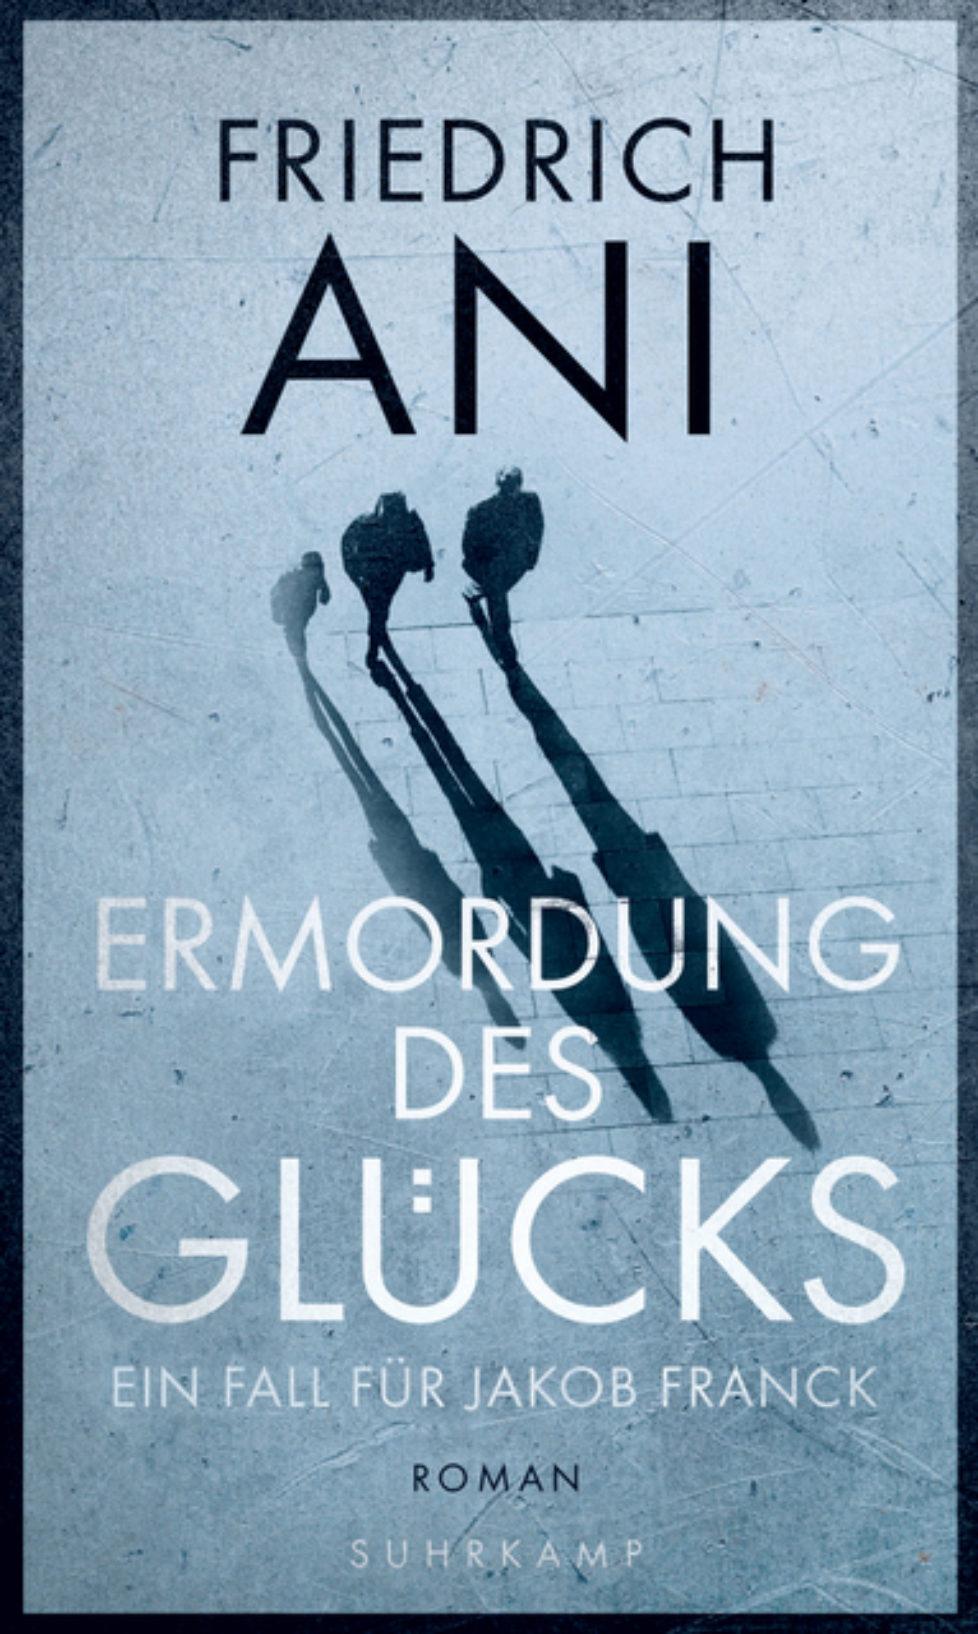 AniErmordungdesGlücks